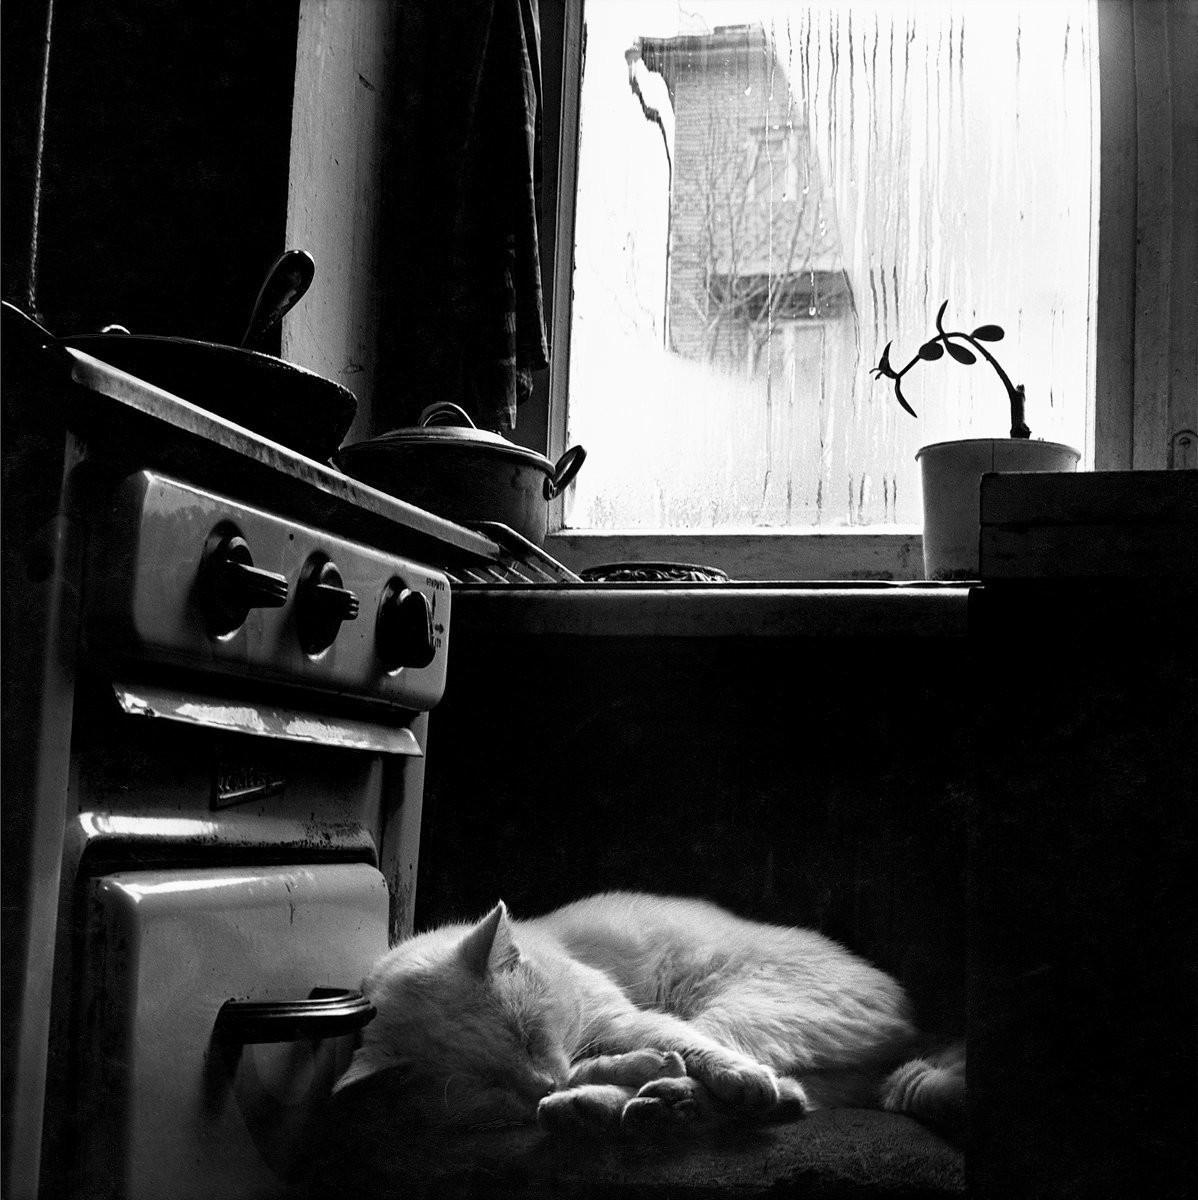 Кот на кухне, 1981. Фотограф Галина Лукьянова